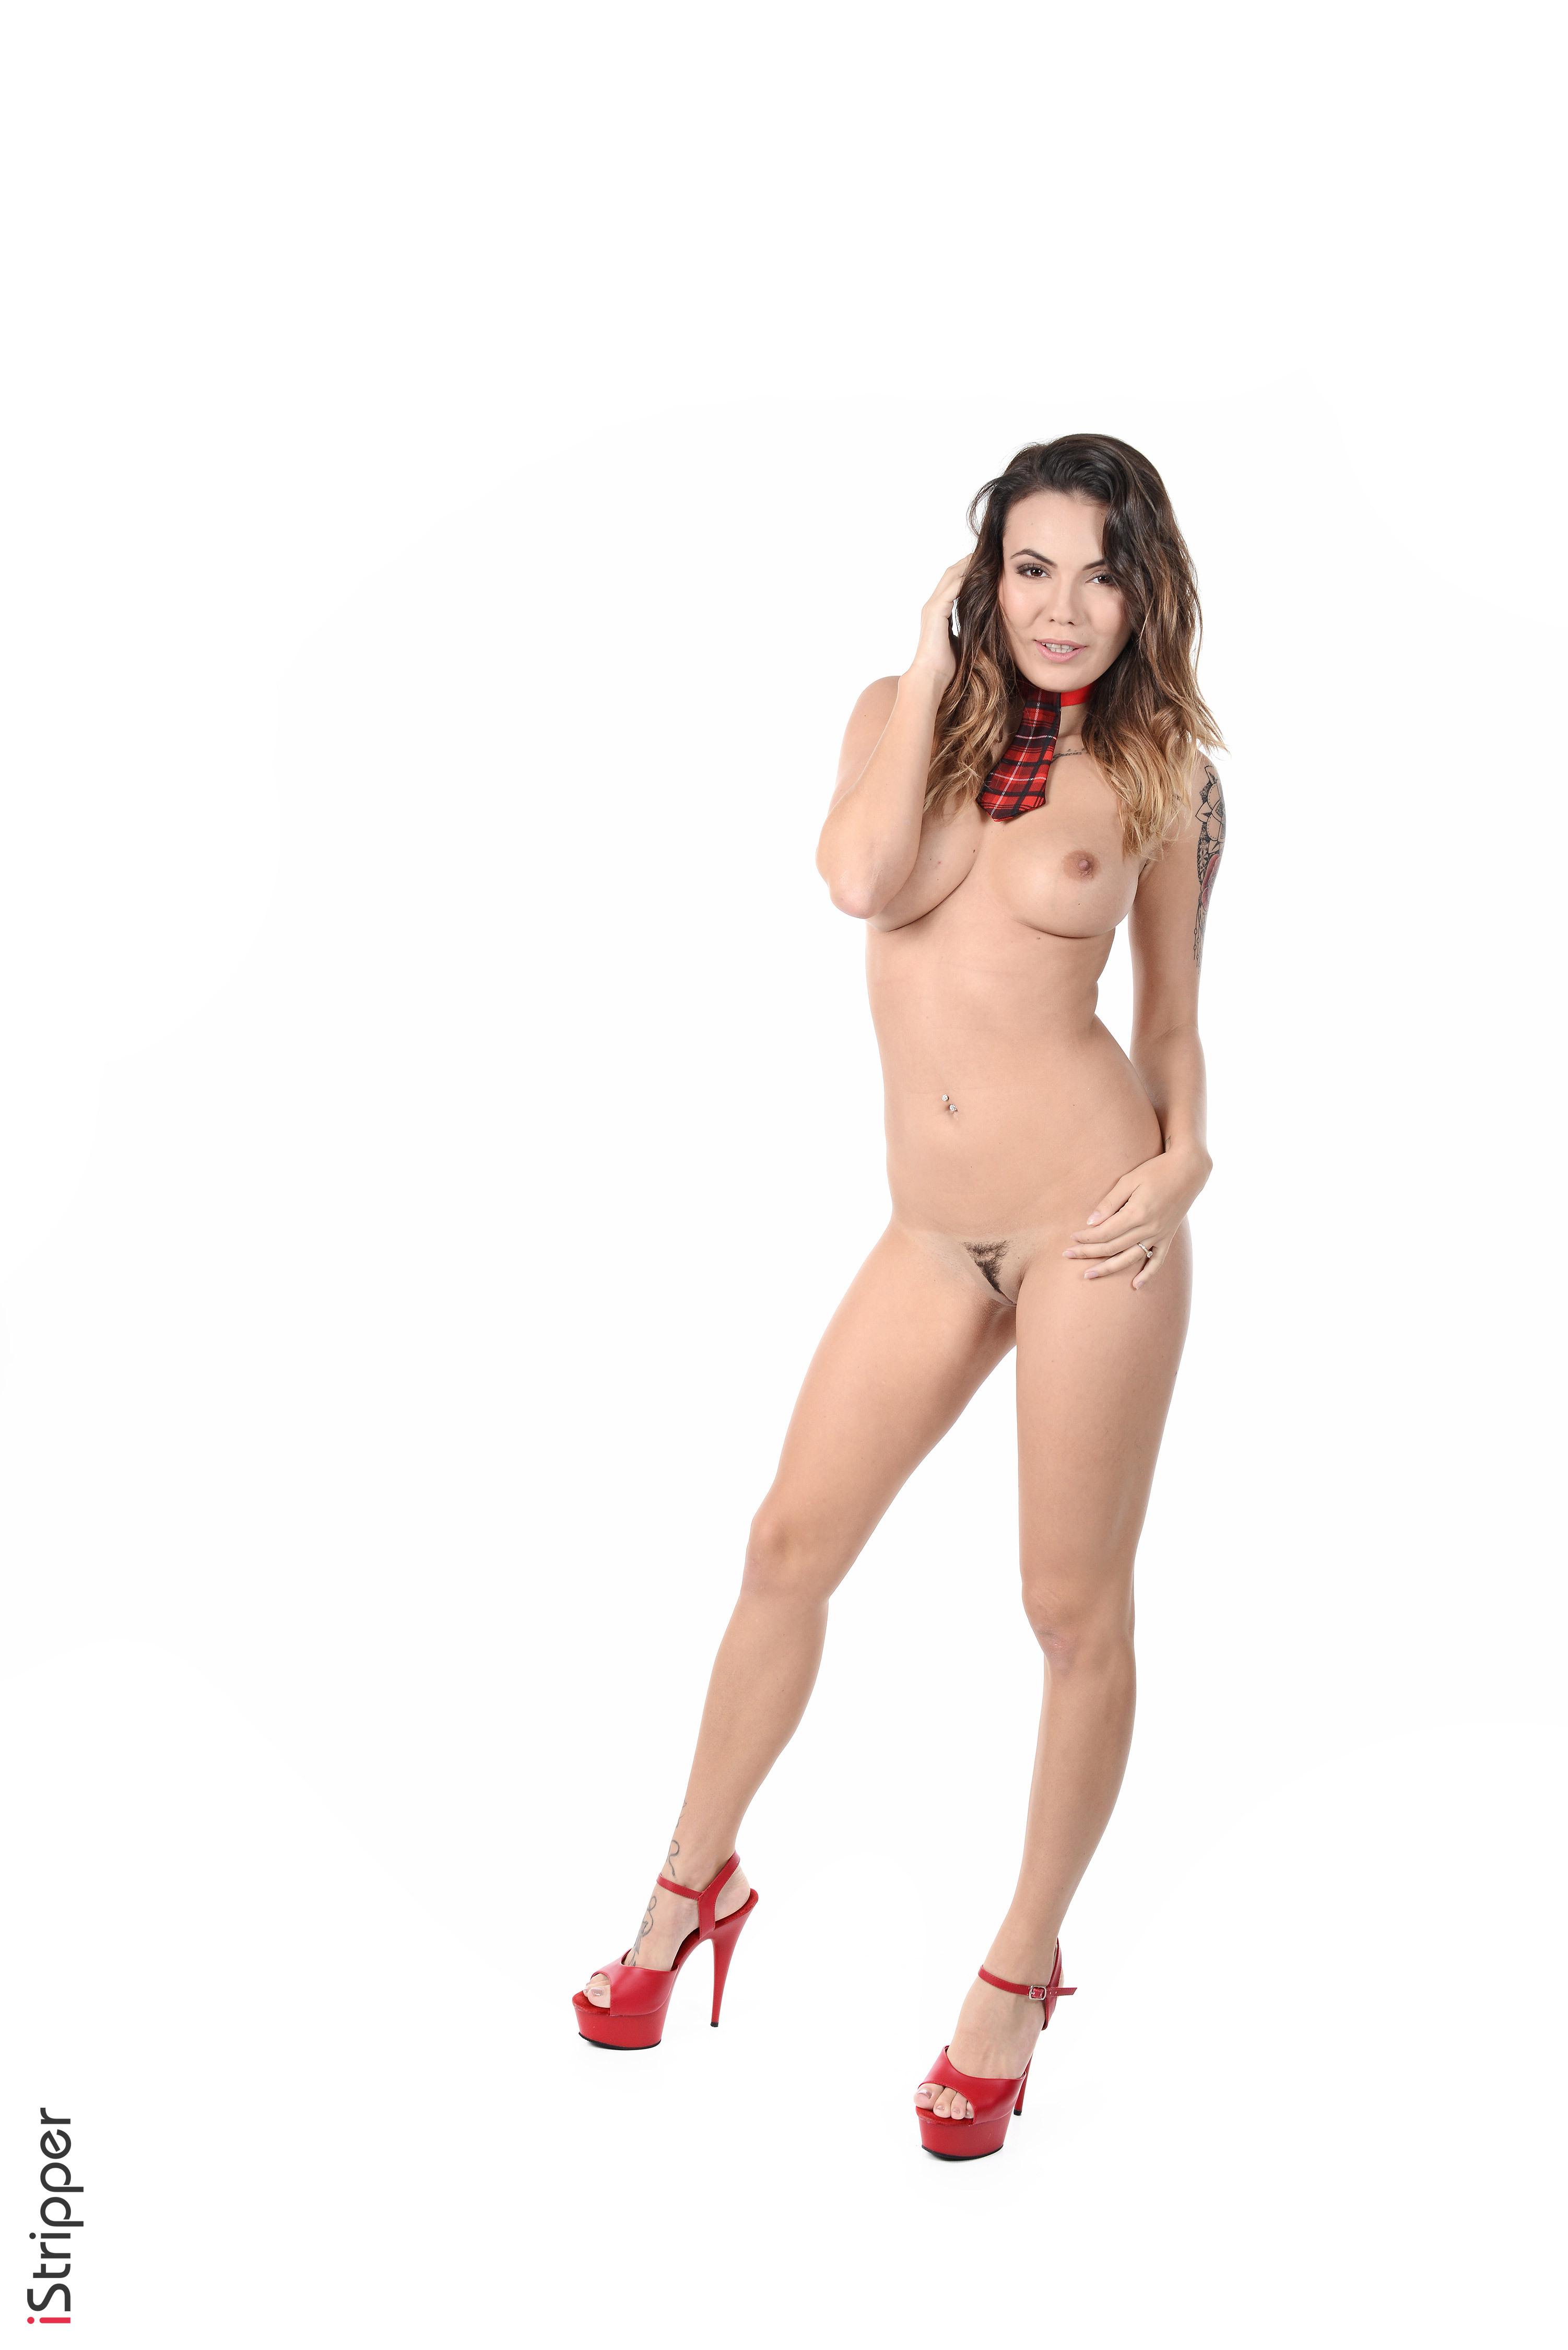 pussy on big dick